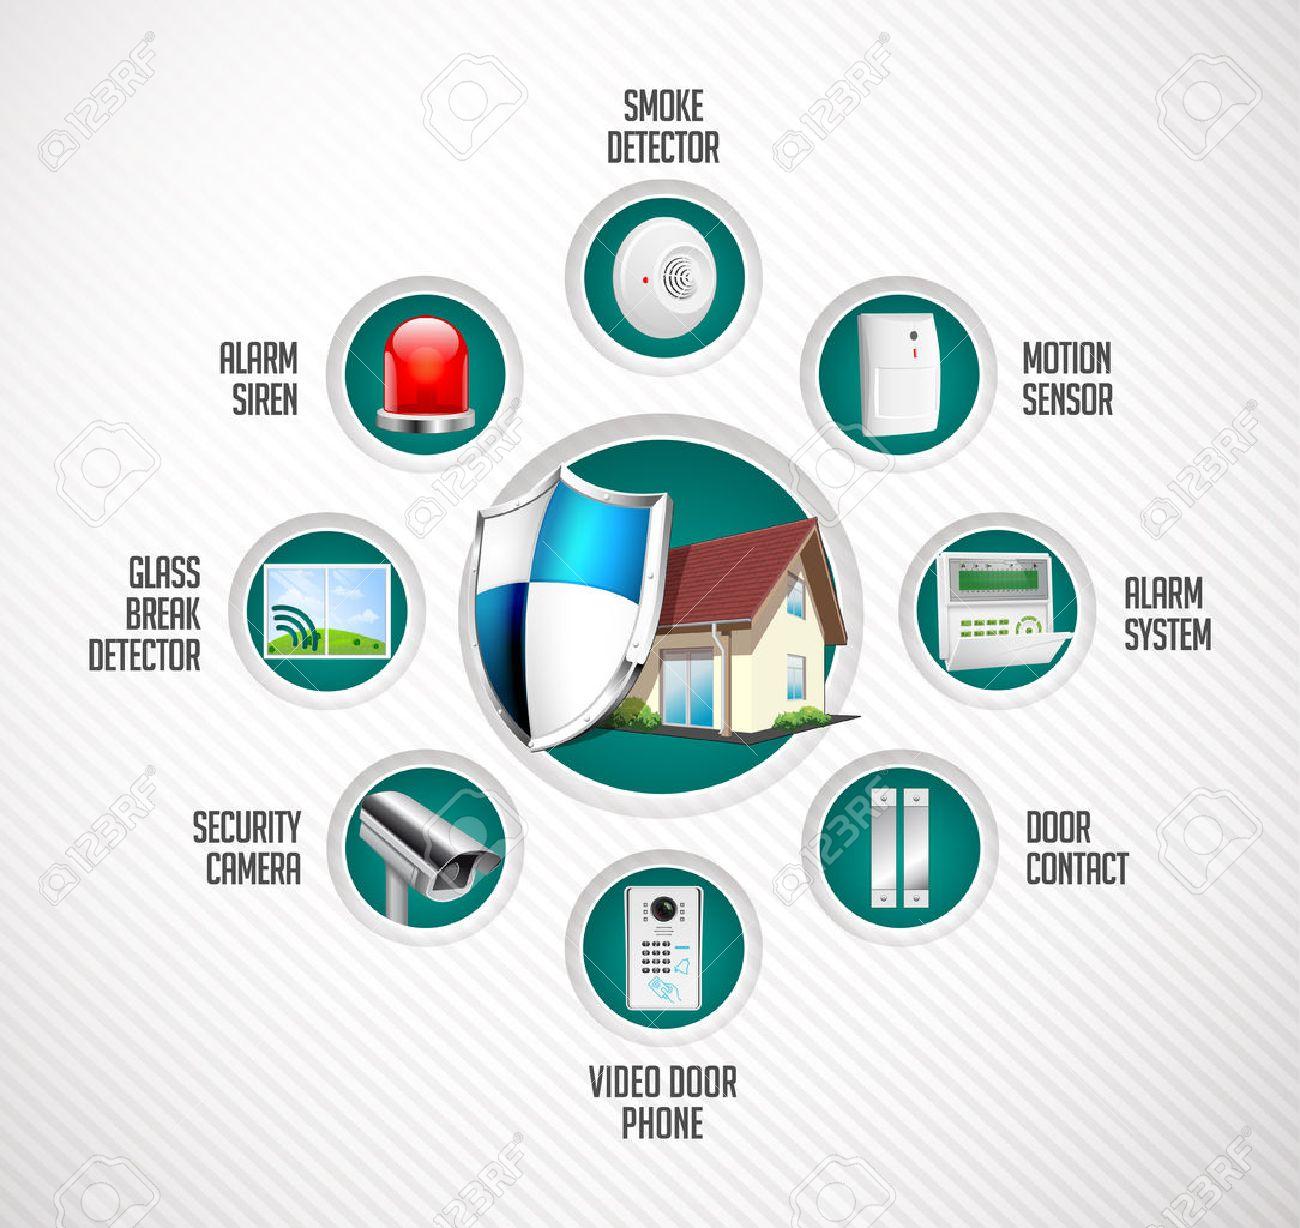 Home security system - motion detector, glass break sensor, gas detector, cctv camera, alarm siren, video door phone, alarm system concept - 57606258